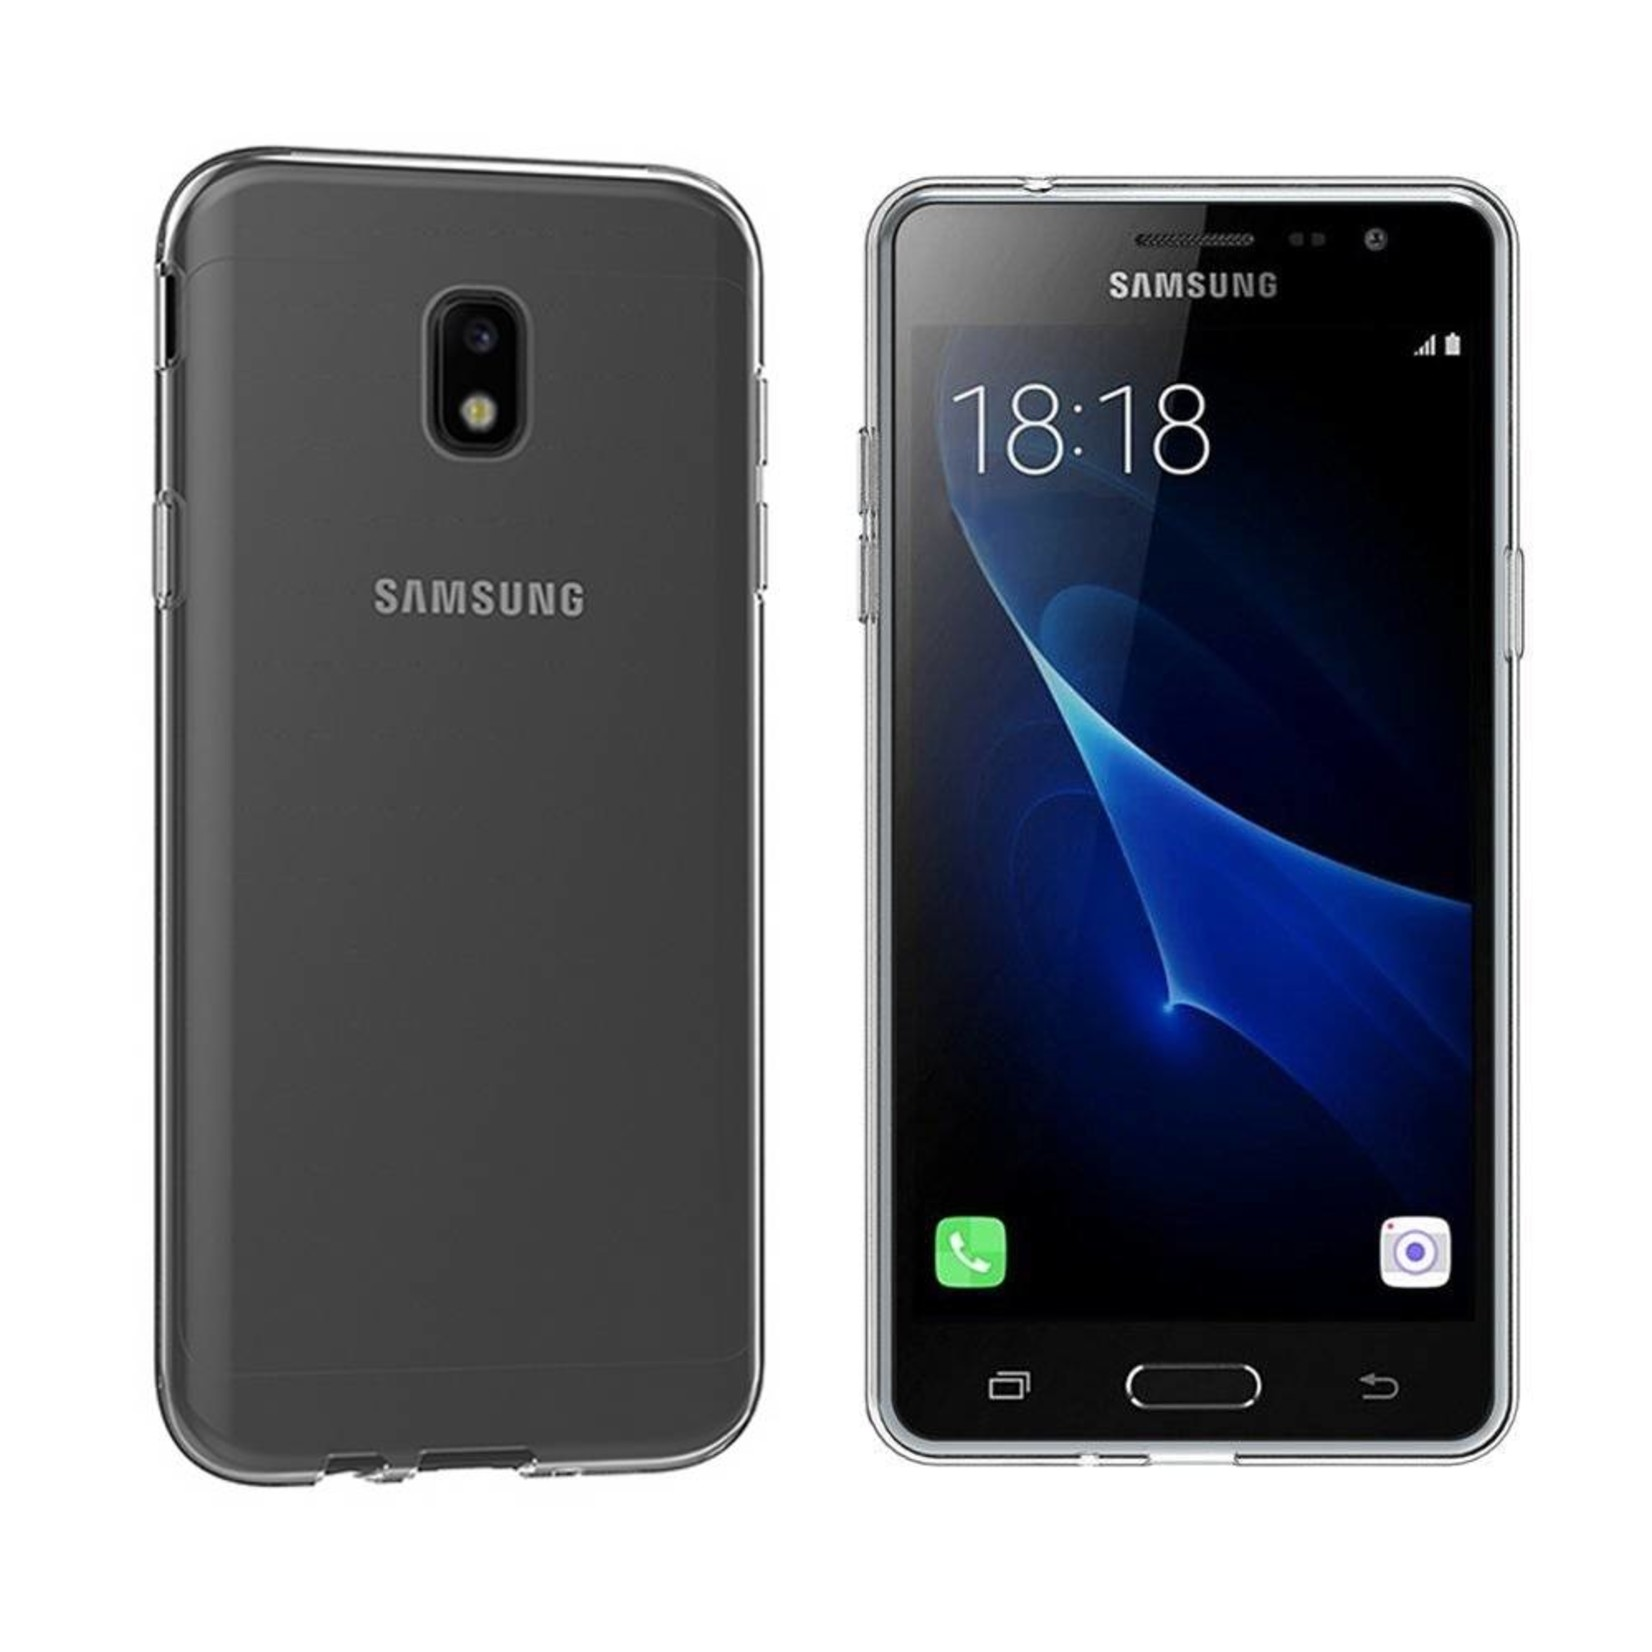 Colorfone Hoesje CoolSkin3T voor Samsung Galaxy J3 2017 Tr. Wit